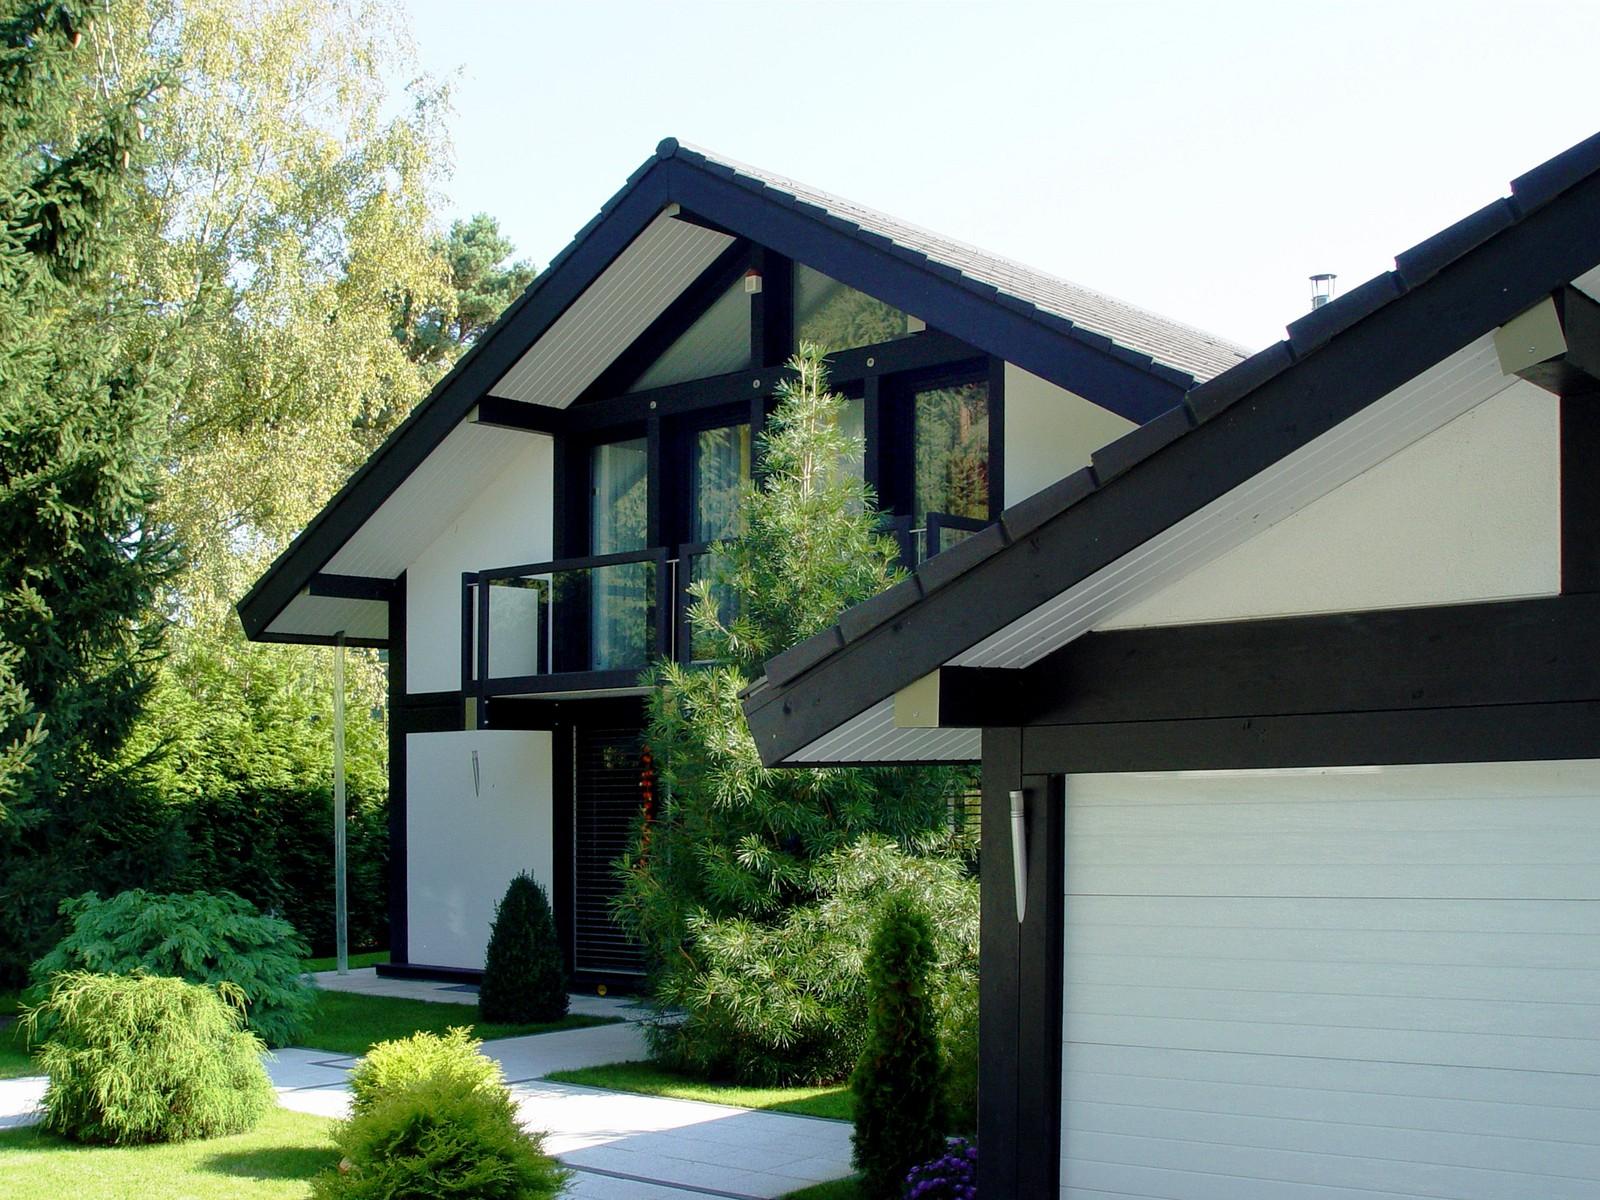 fachwerkhaus dunkle konstruktion holz skelett haus landhaus 8 concentus moderne fachwerkh user. Black Bedroom Furniture Sets. Home Design Ideas